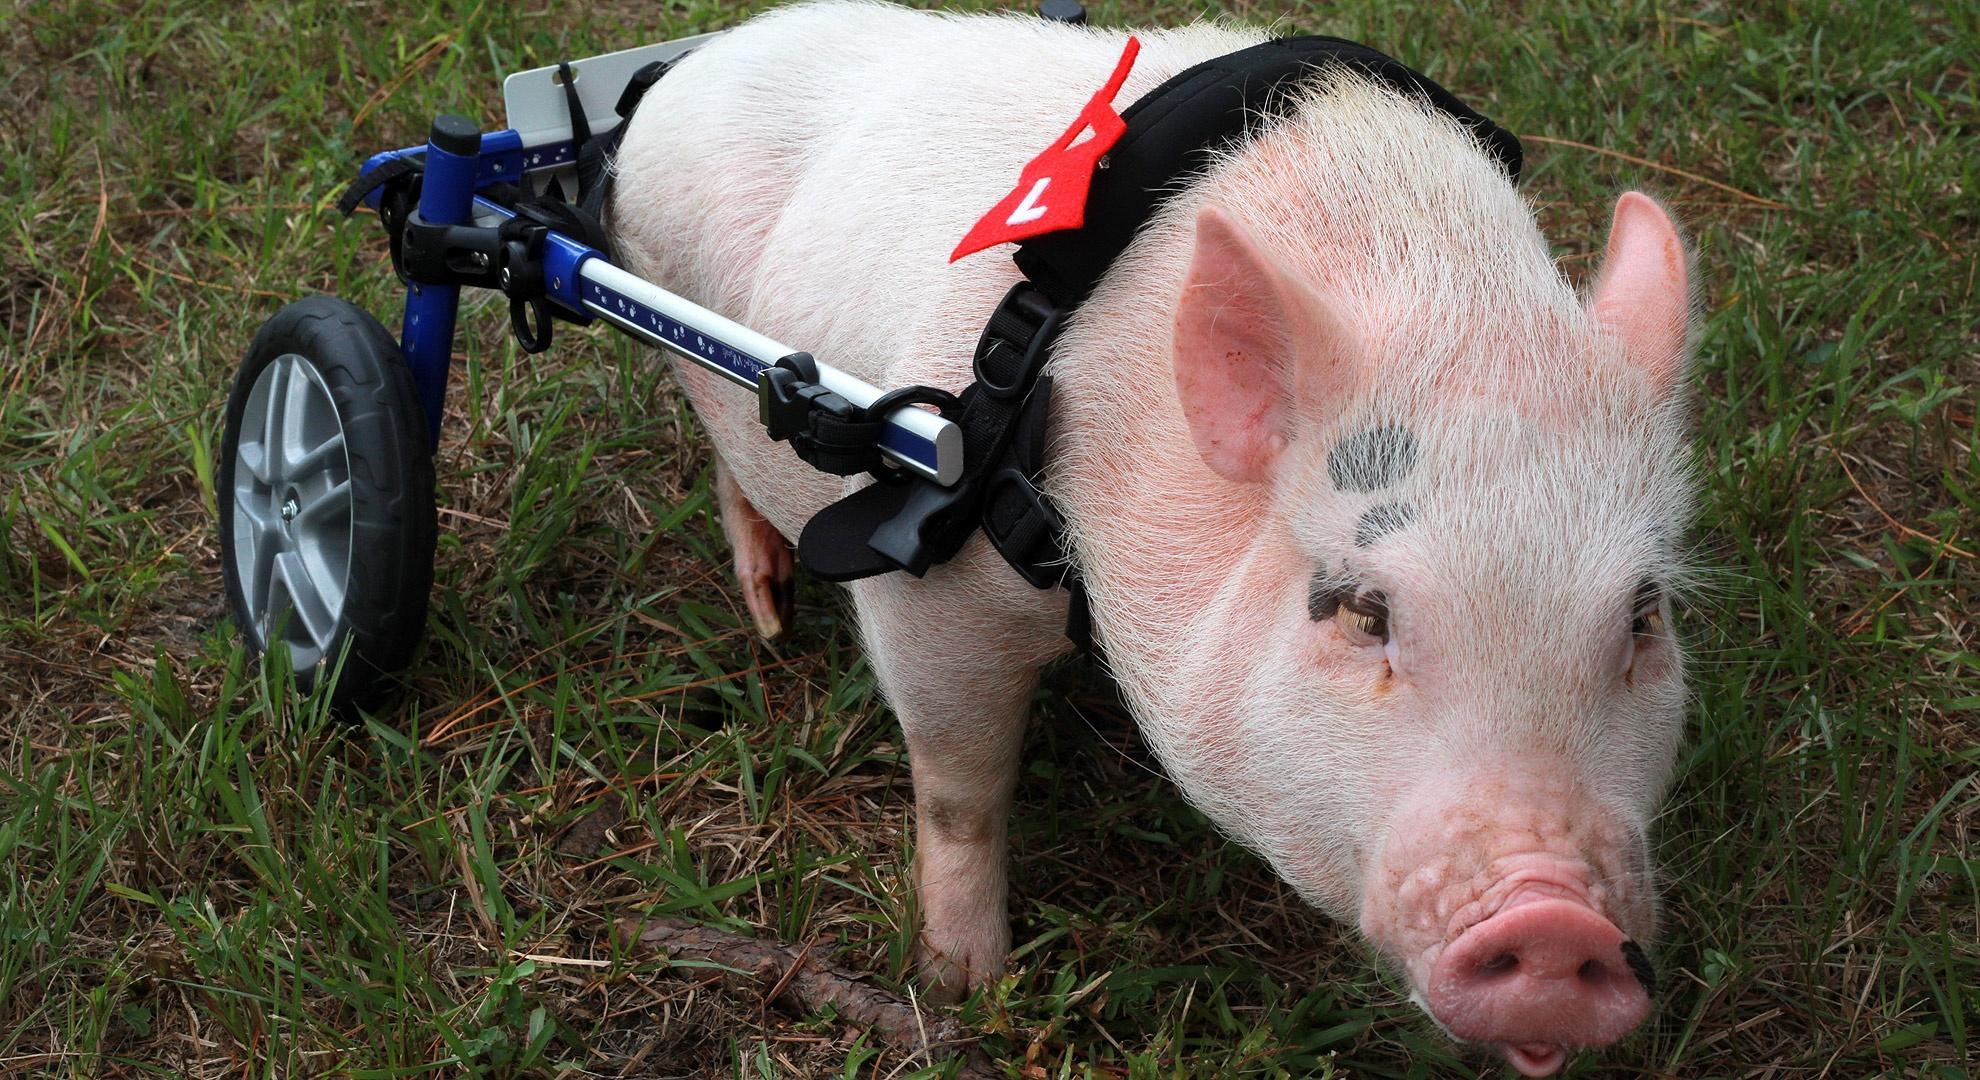 My Bionic Pet image